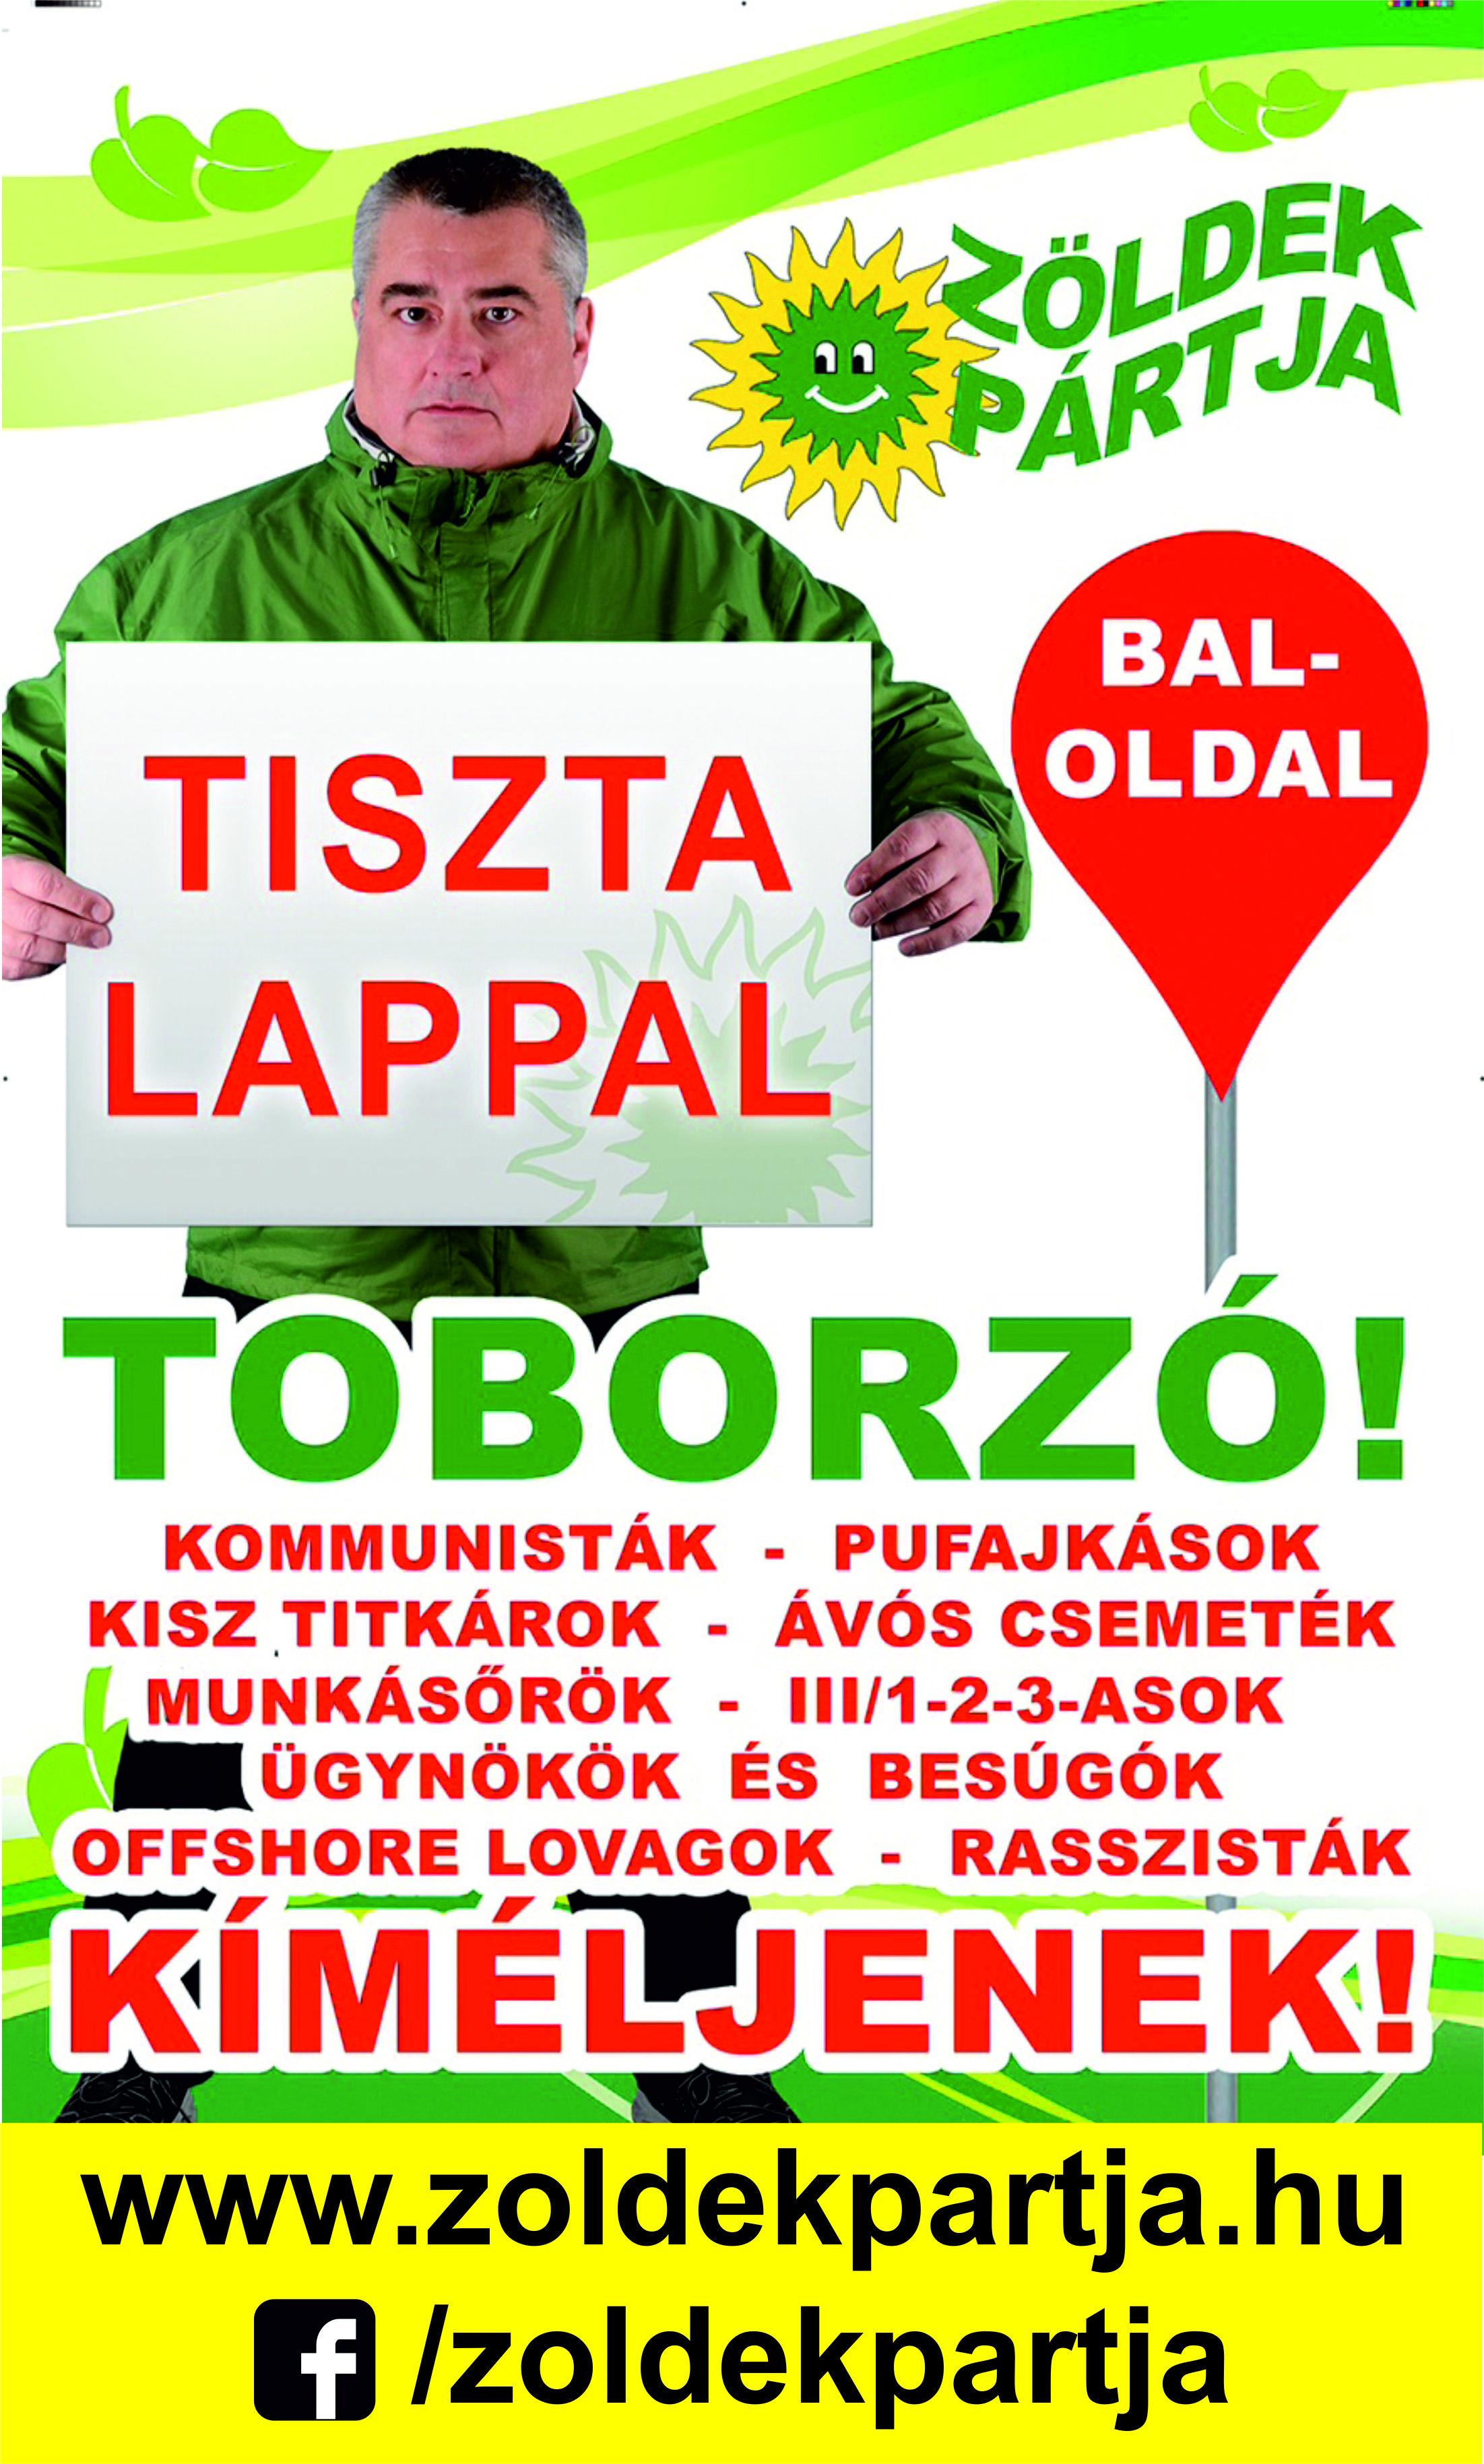 zoldek_toborzo_allo.jpg